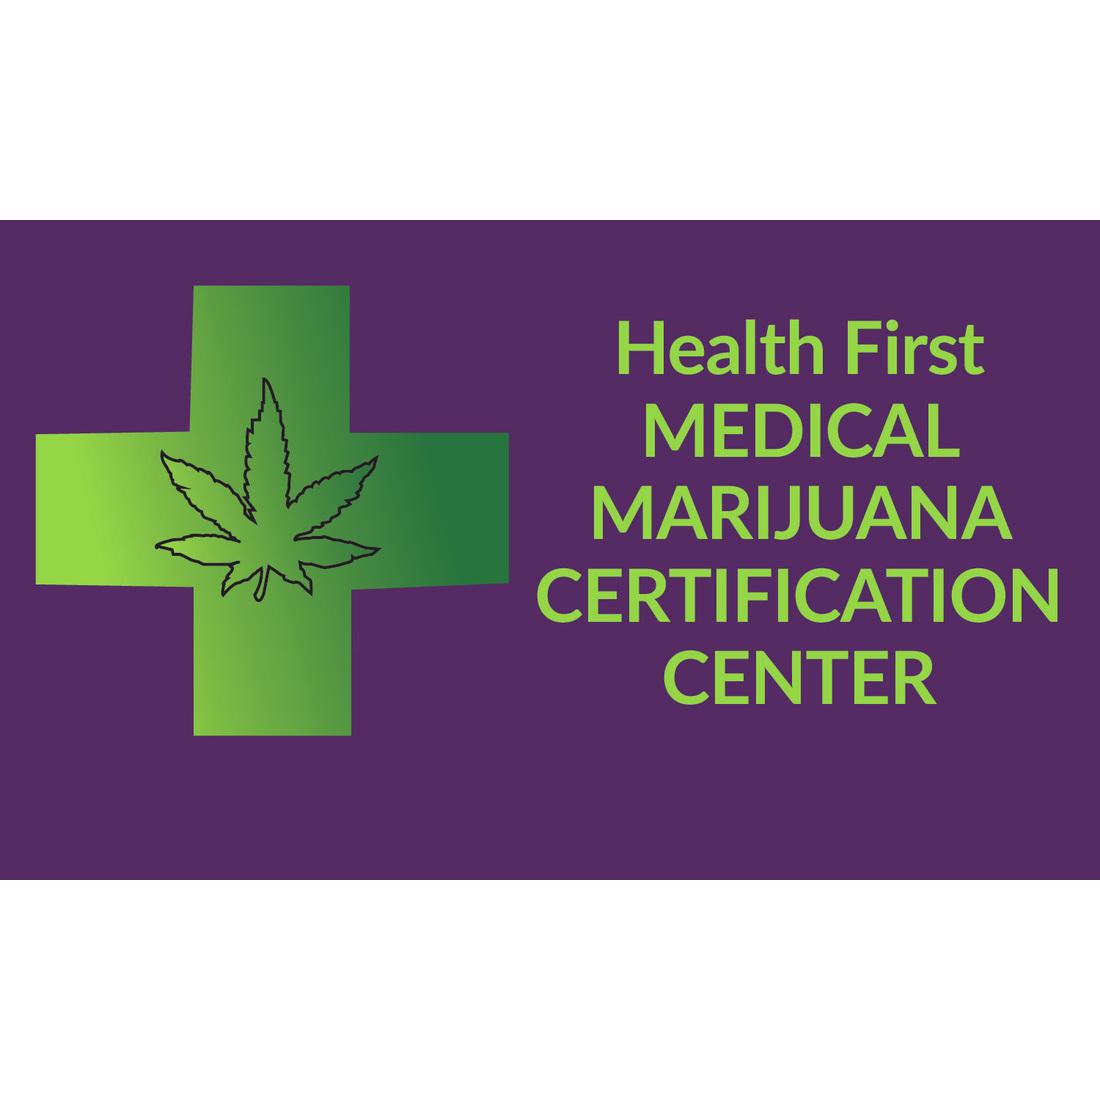 Health first medical marijuana certification center in tempe az health first medical marijuana certification center 1betcityfo Gallery